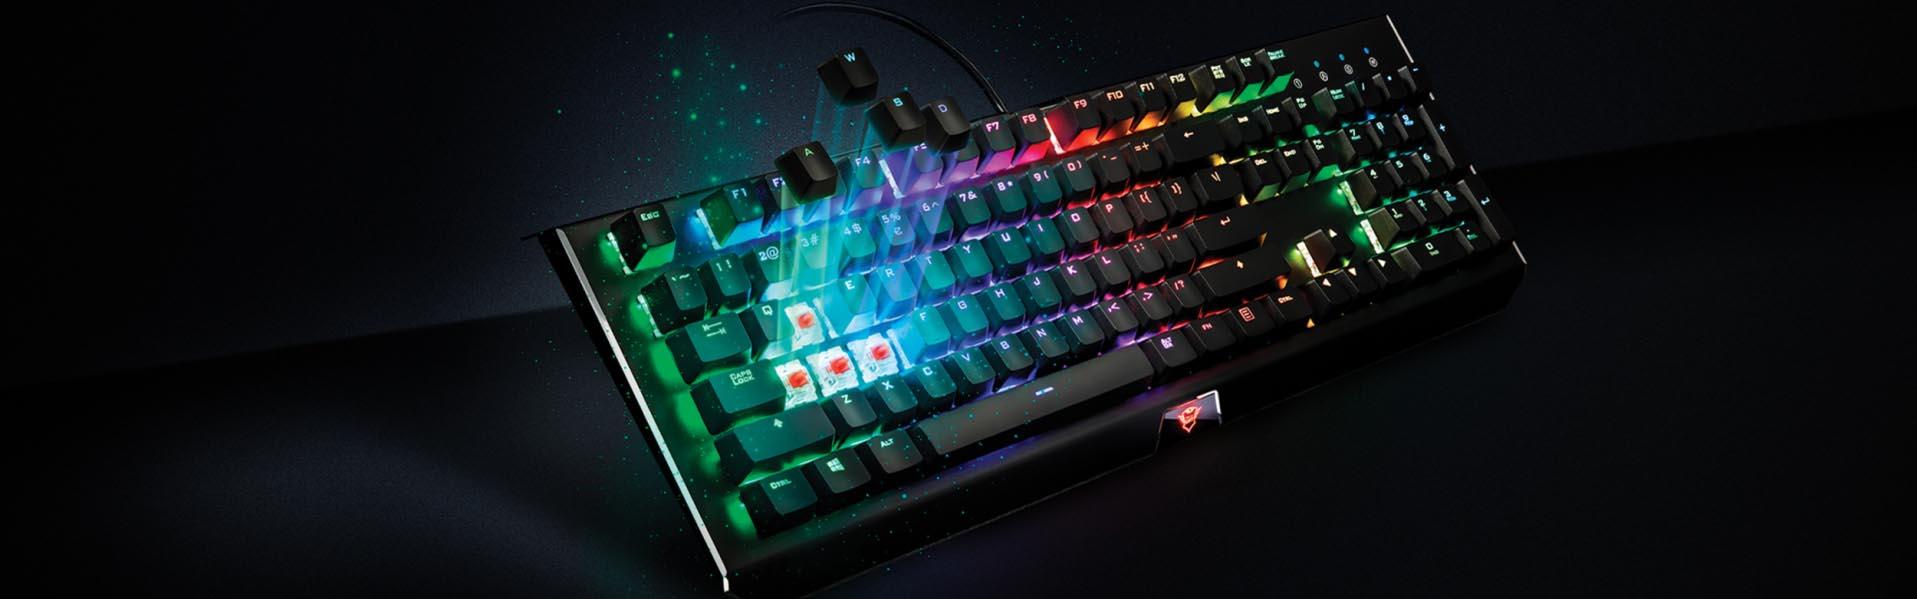 teclado mecânico gamer